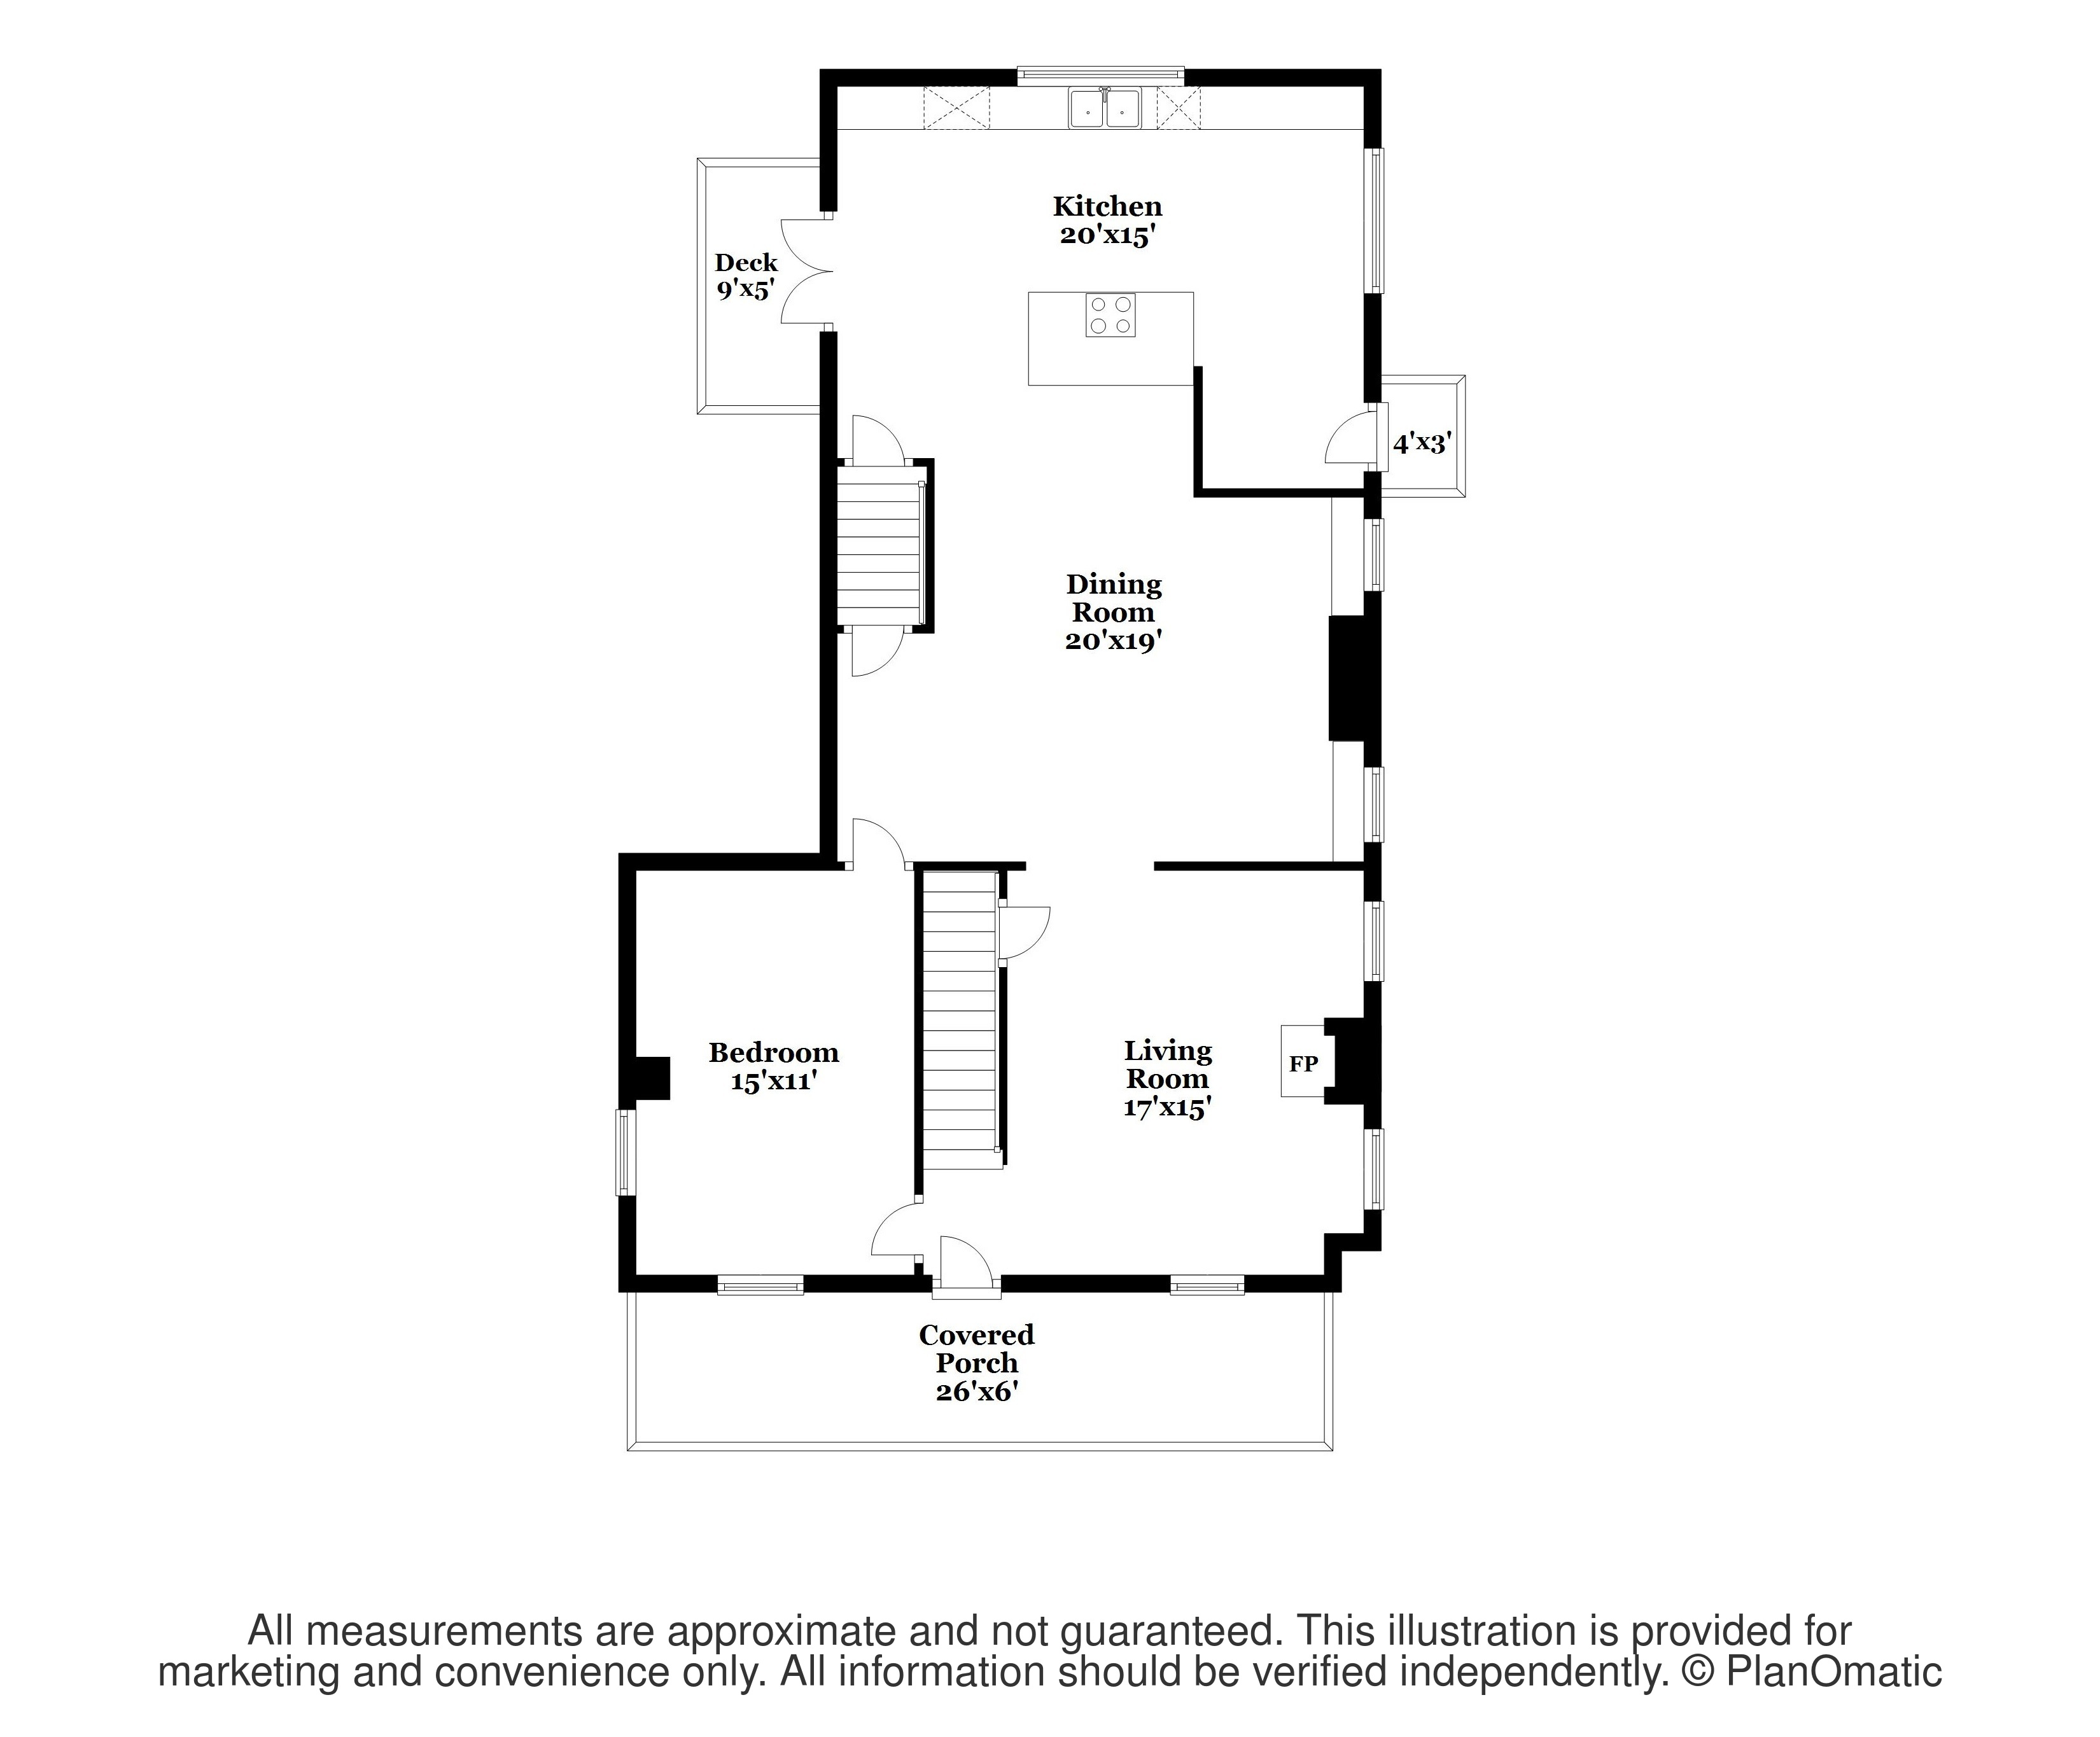 Single Family Homes για την Πώληση στο A True Colonial Home Full of Cheerful Surprises 115 Mountain Avenue, Princeton, Νιου Τζερσεϋ 08540 Ηνωμένες Πολιτείες